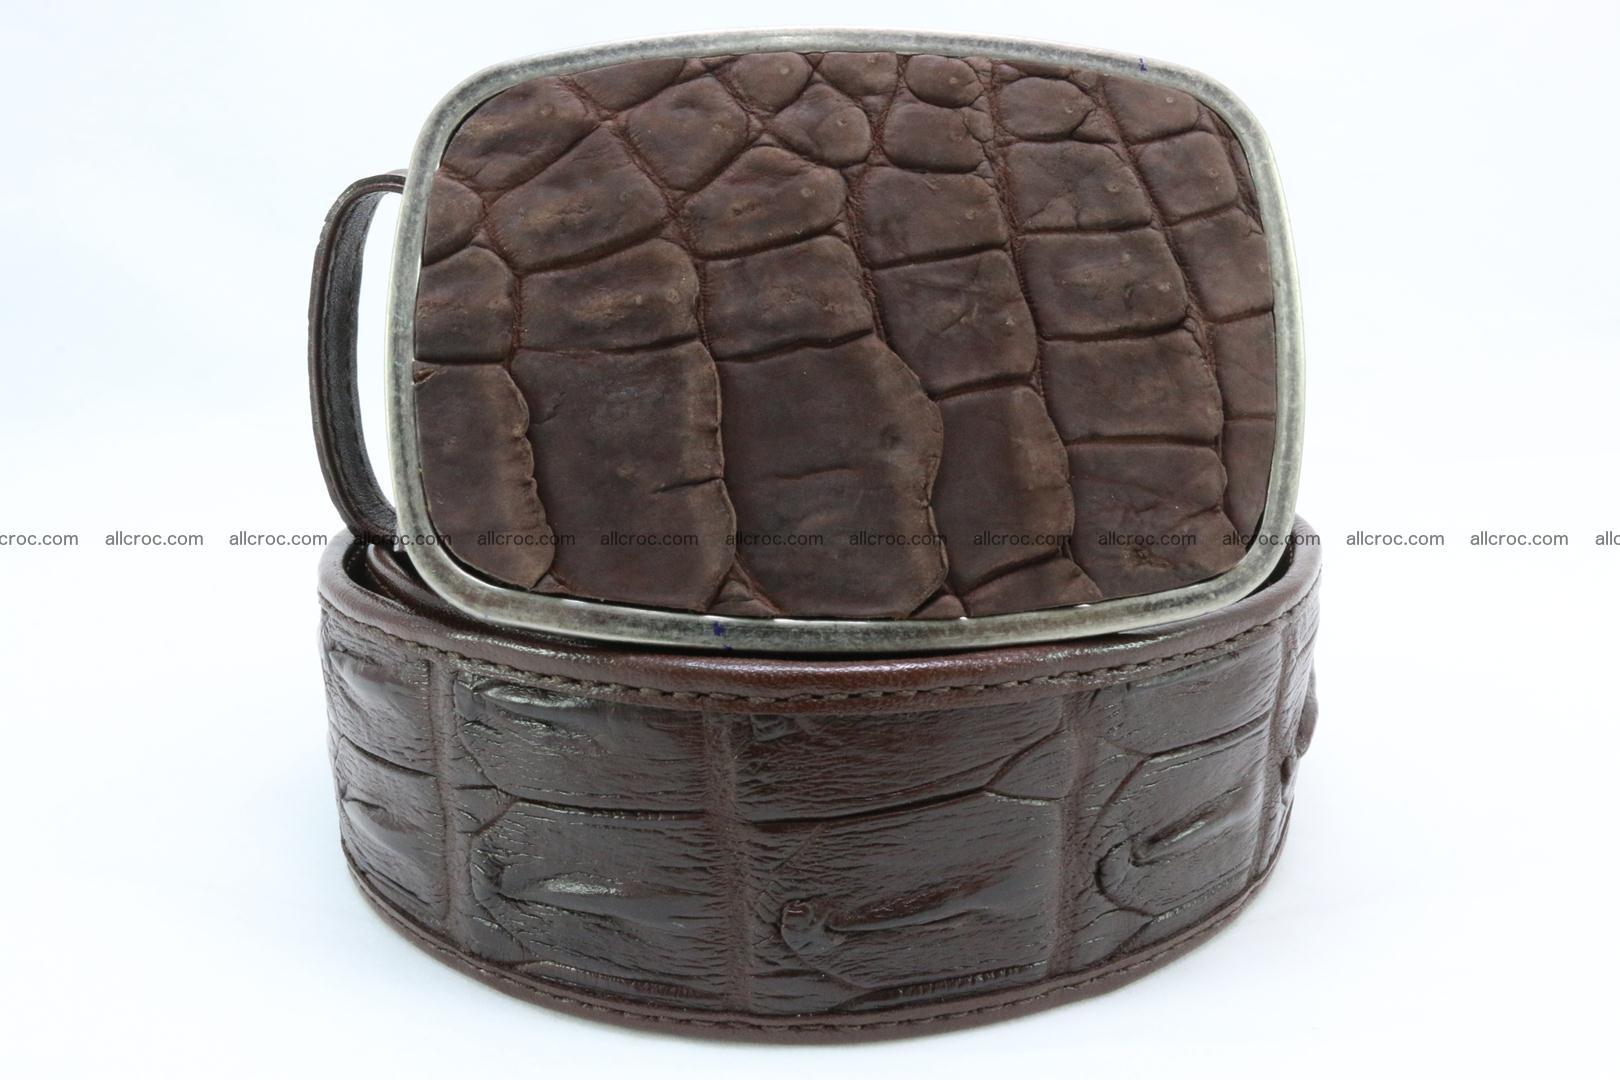 Genuine crocodile leather hornback belt 086 Foto 1